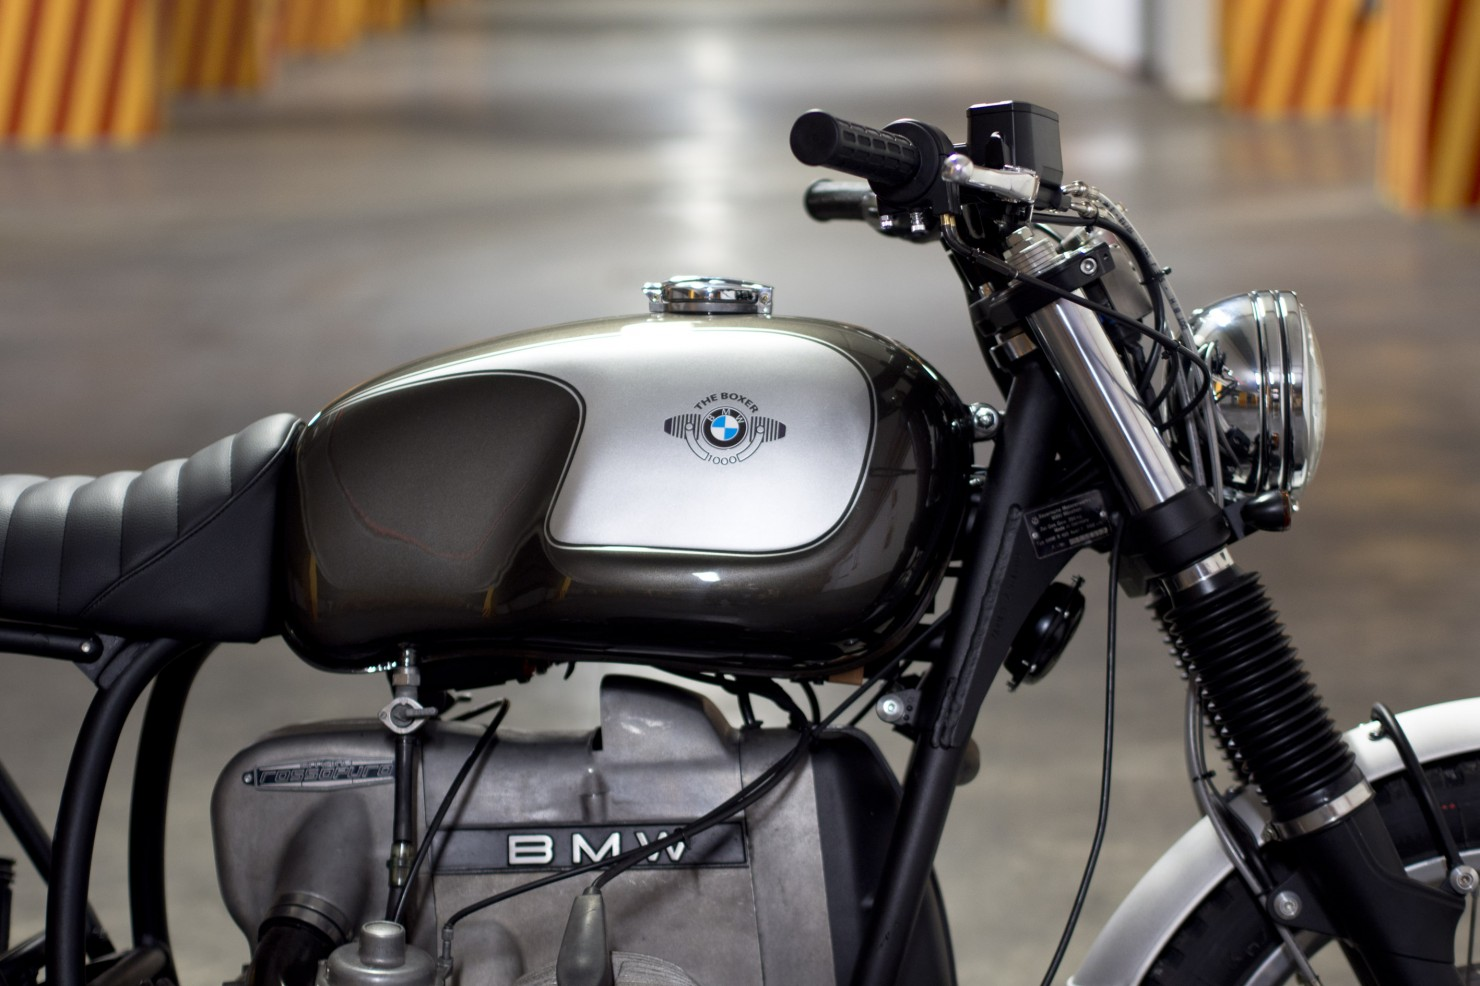 BMW Scrambler 5